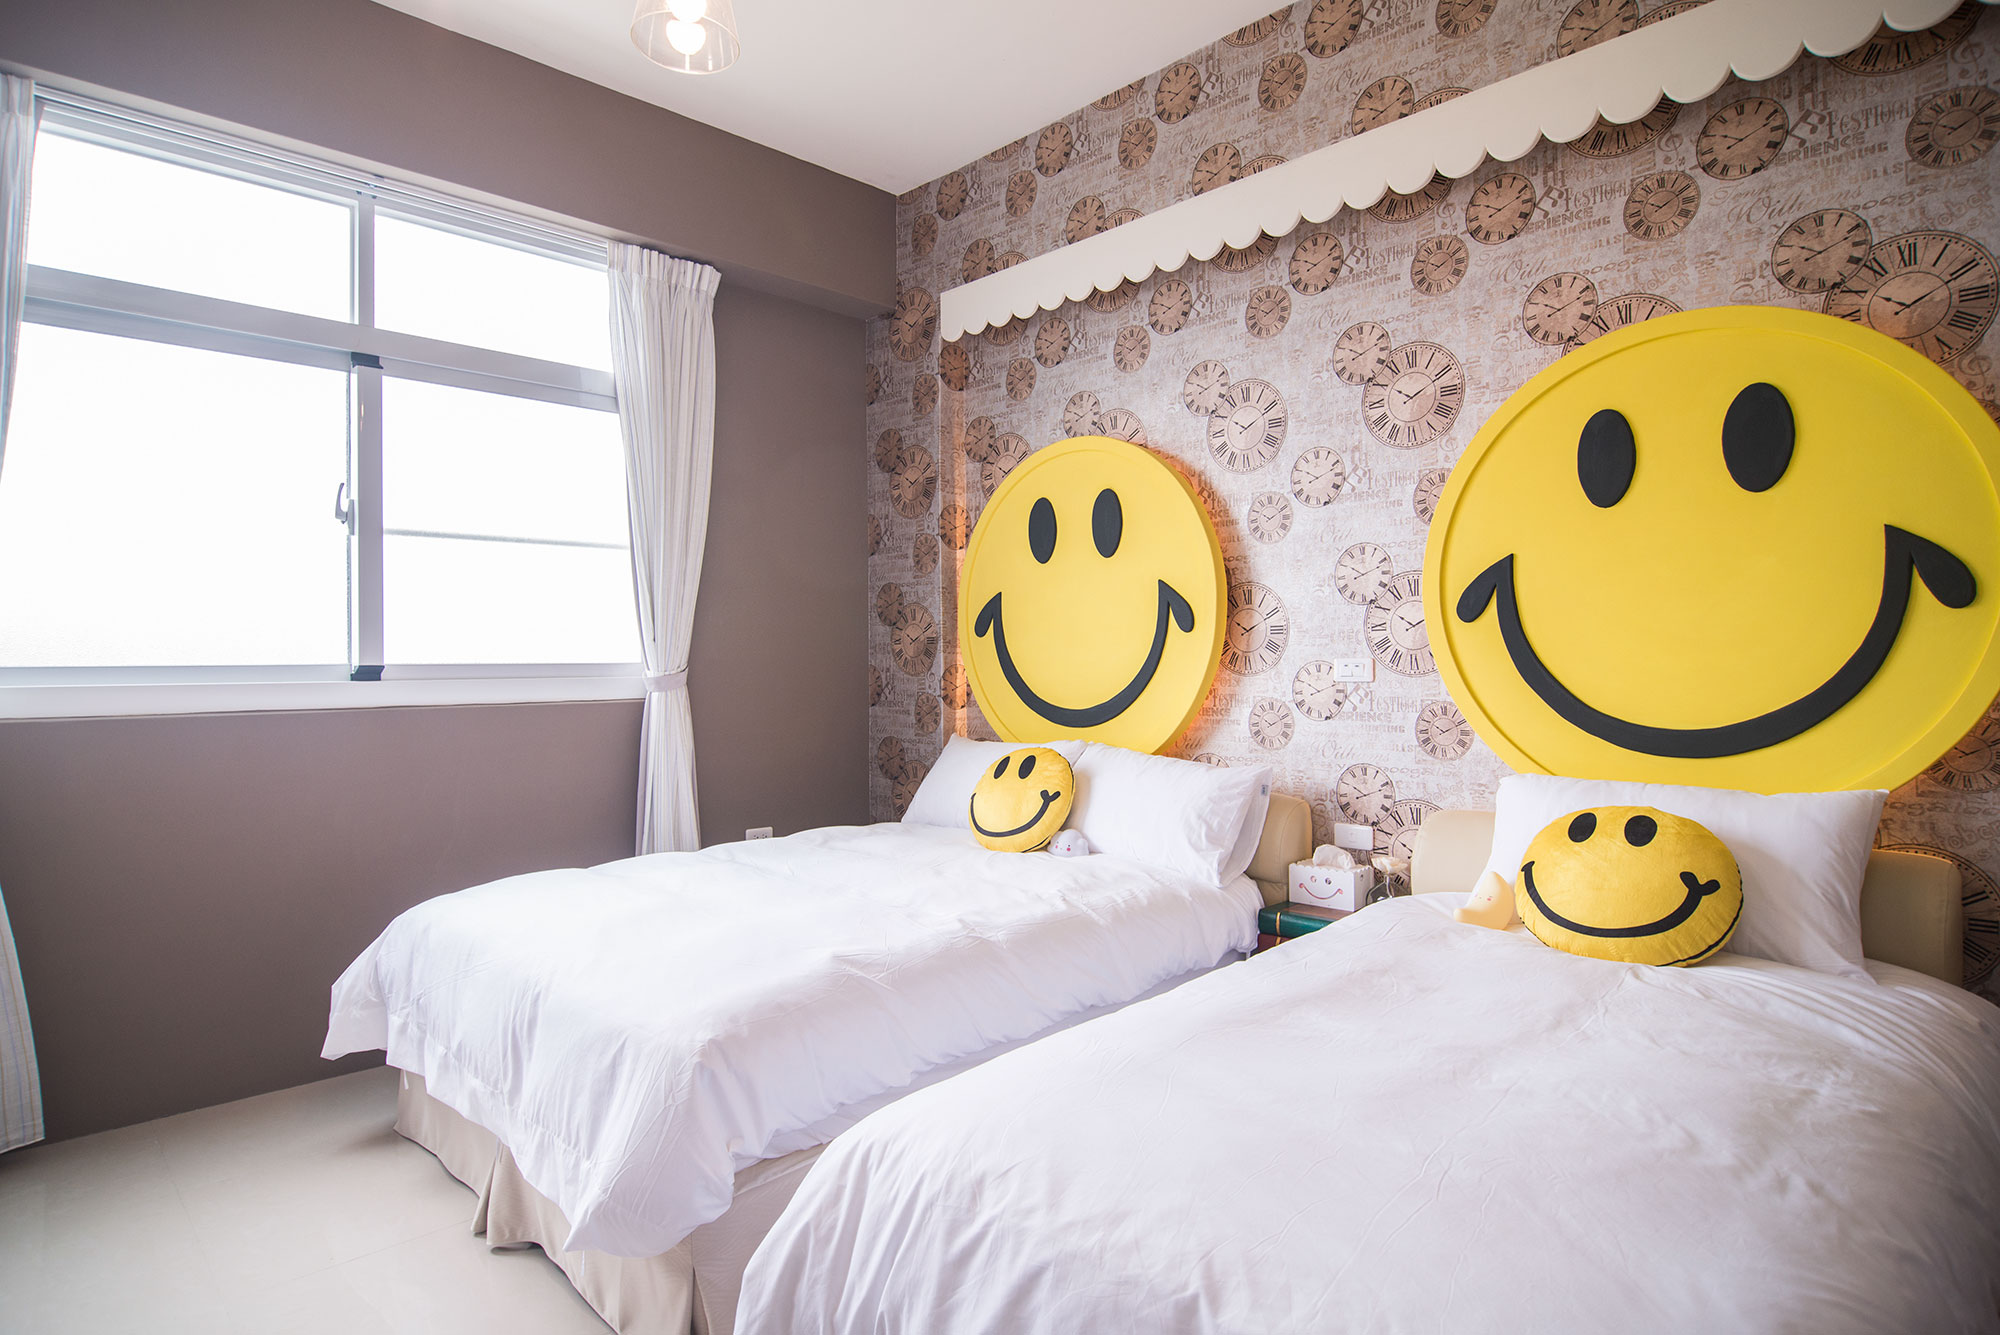 smile-bnb 402